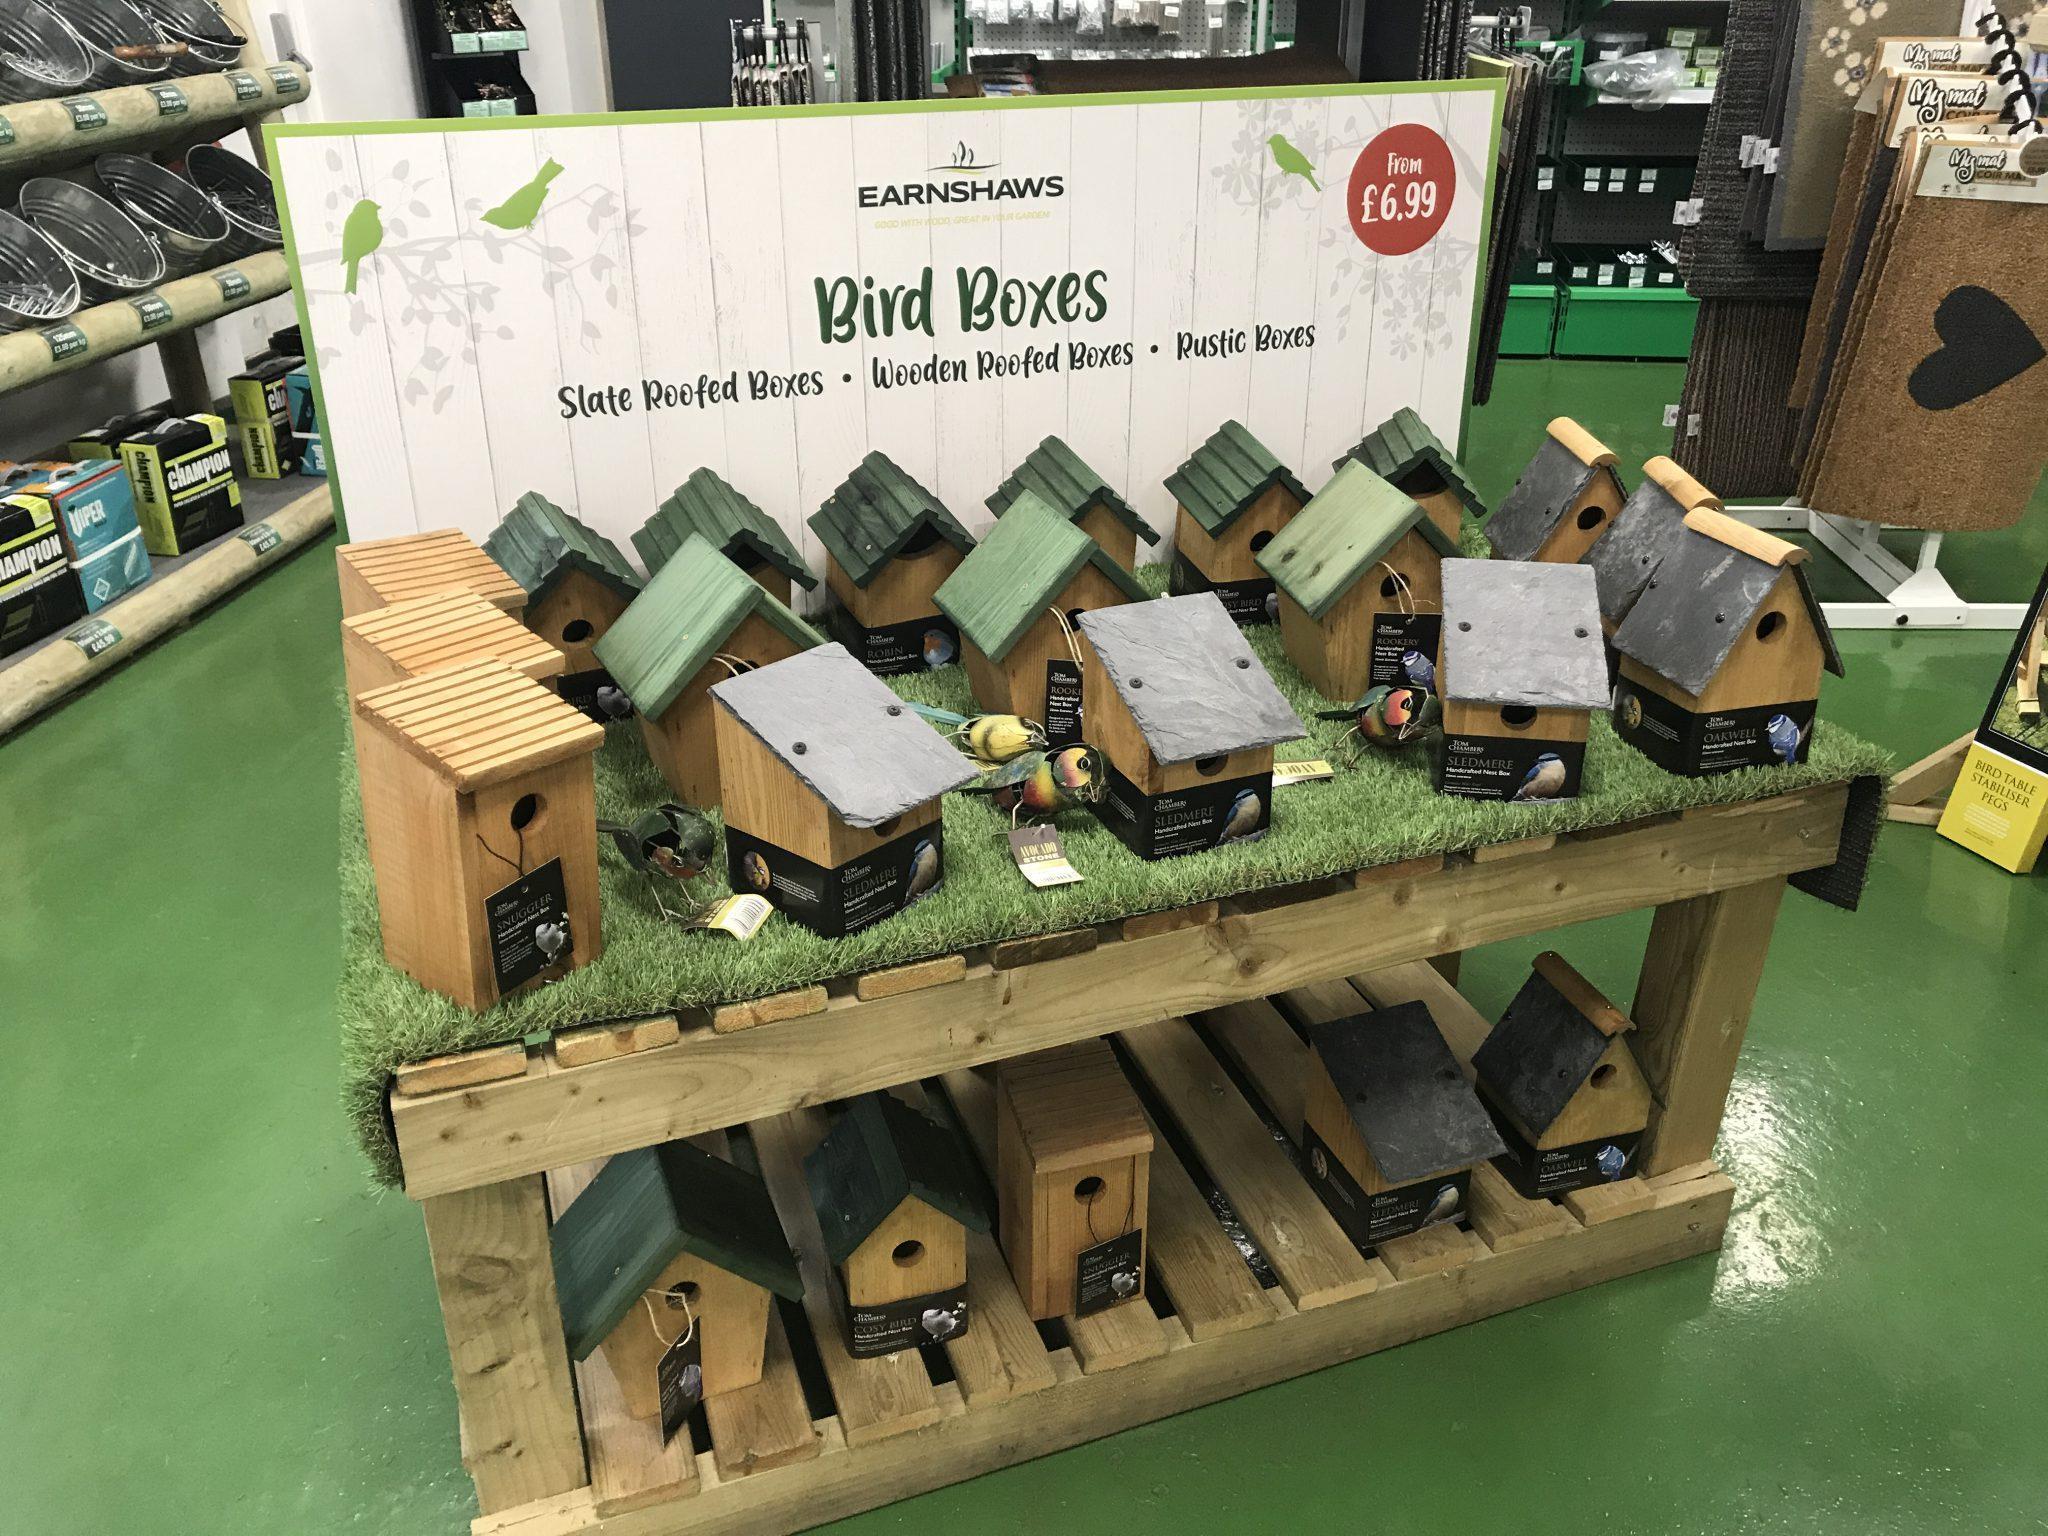 bird houses in garden earnshaws